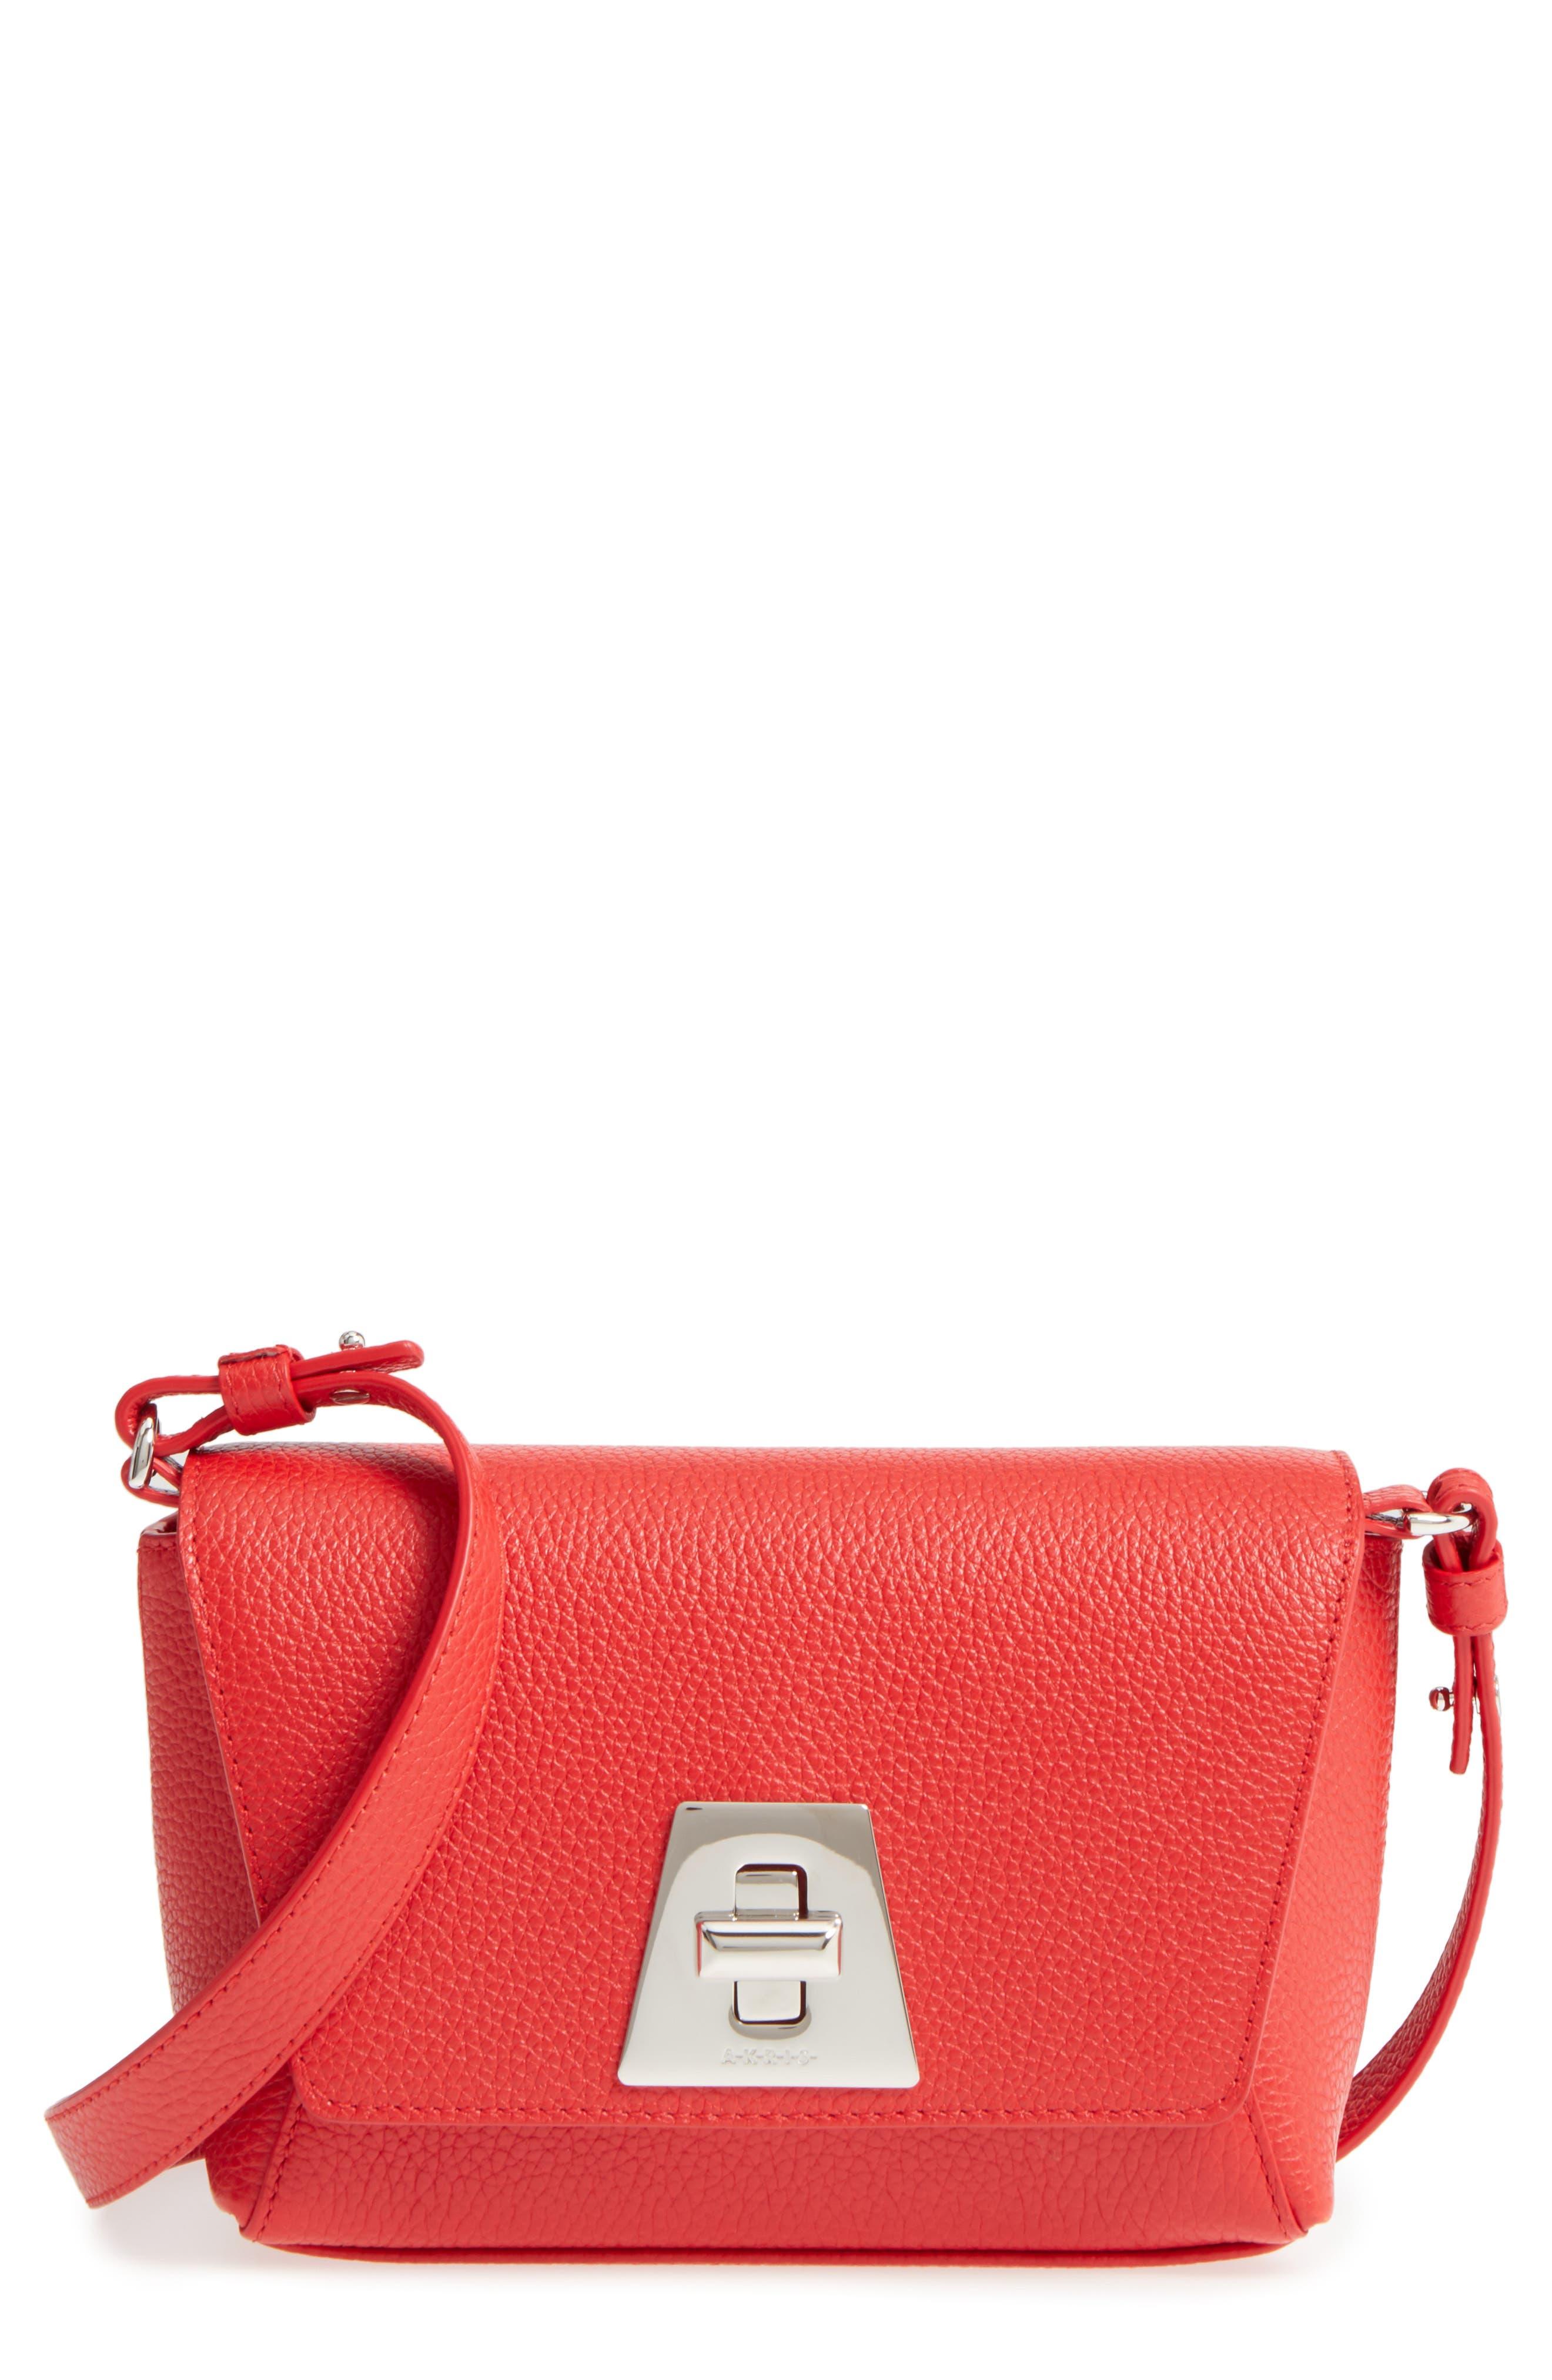 Little Anouk Calfskin Crossbody Bag,                             Main thumbnail 1, color,                             Scarlet